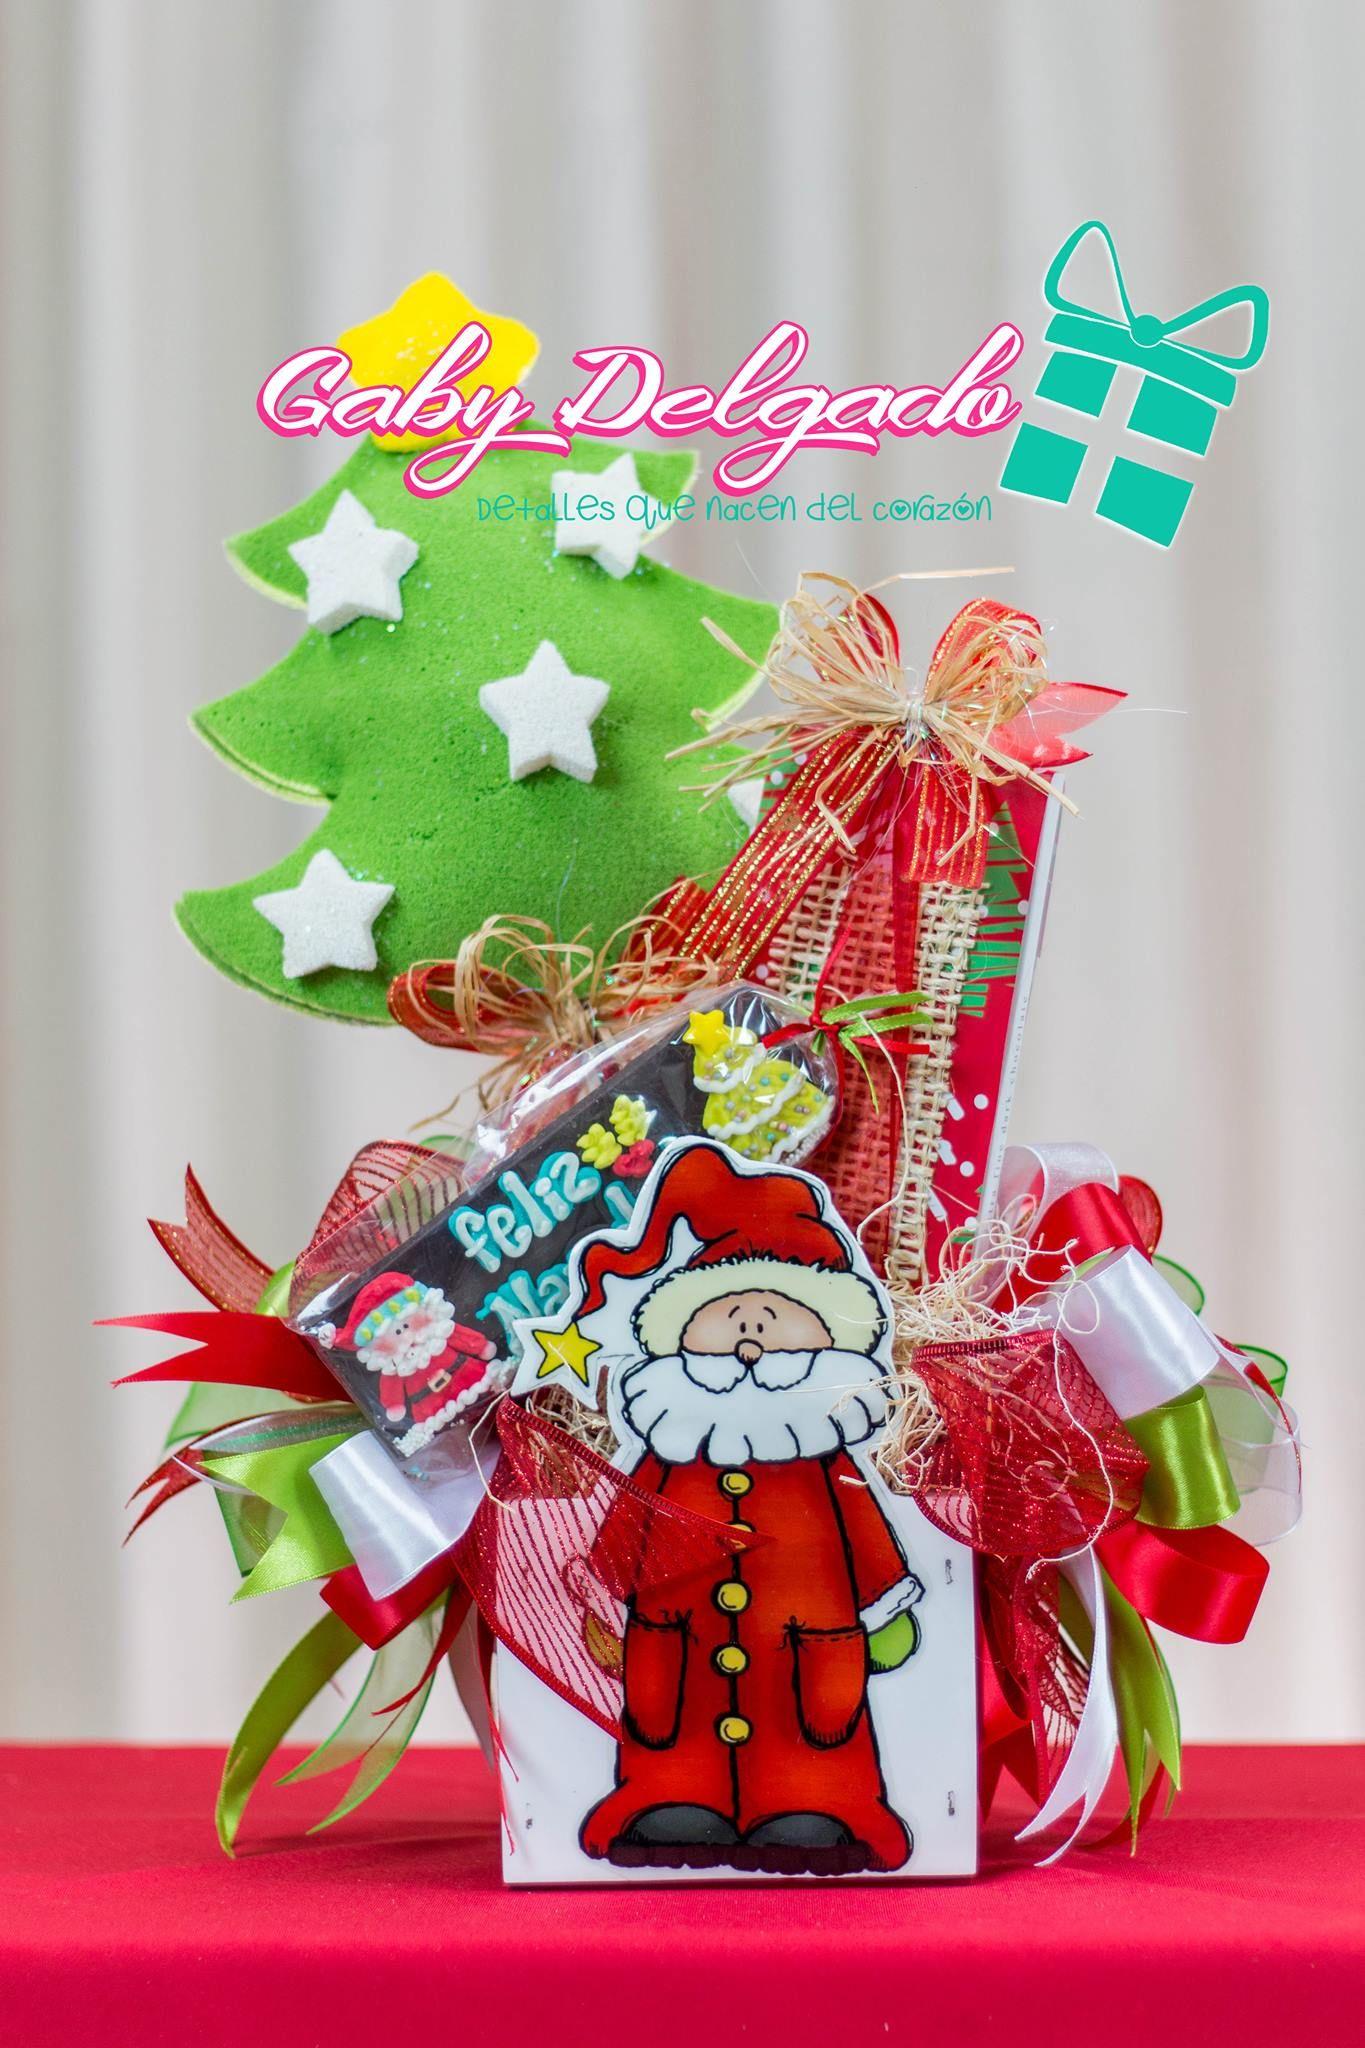 Pin de jazmin cervantes vega en navidad pinterest - Arreglos navidenos para mesa ...